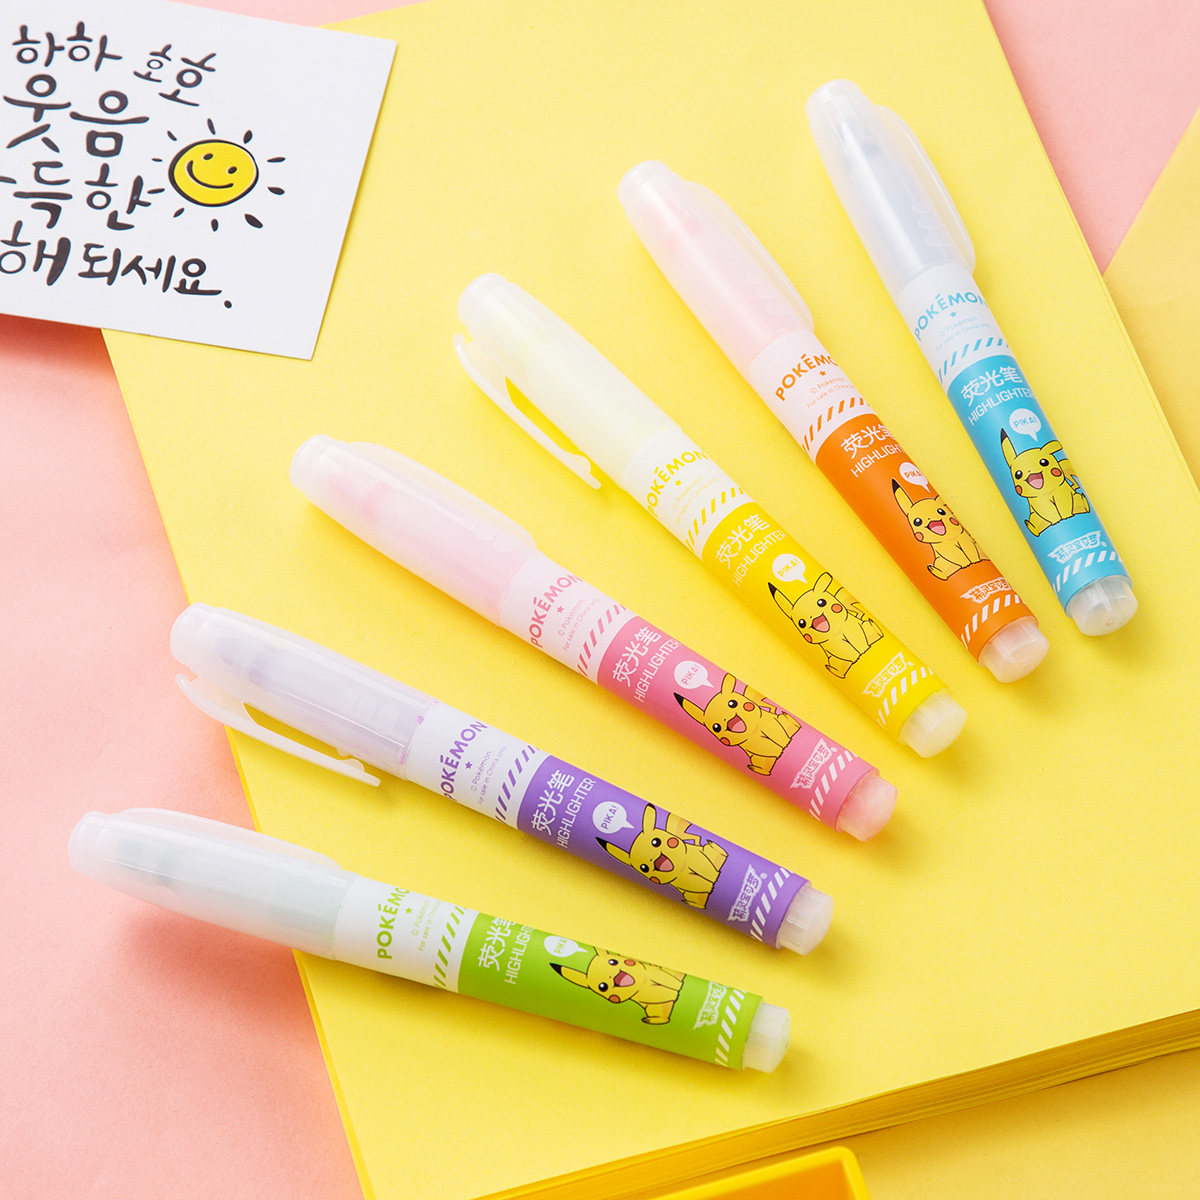 Deli 6pcs Highlighter Pokemon Invisible Ink Marker Pen Fluorescent Color Art Mildliner School Chancery Stationery Office Supply